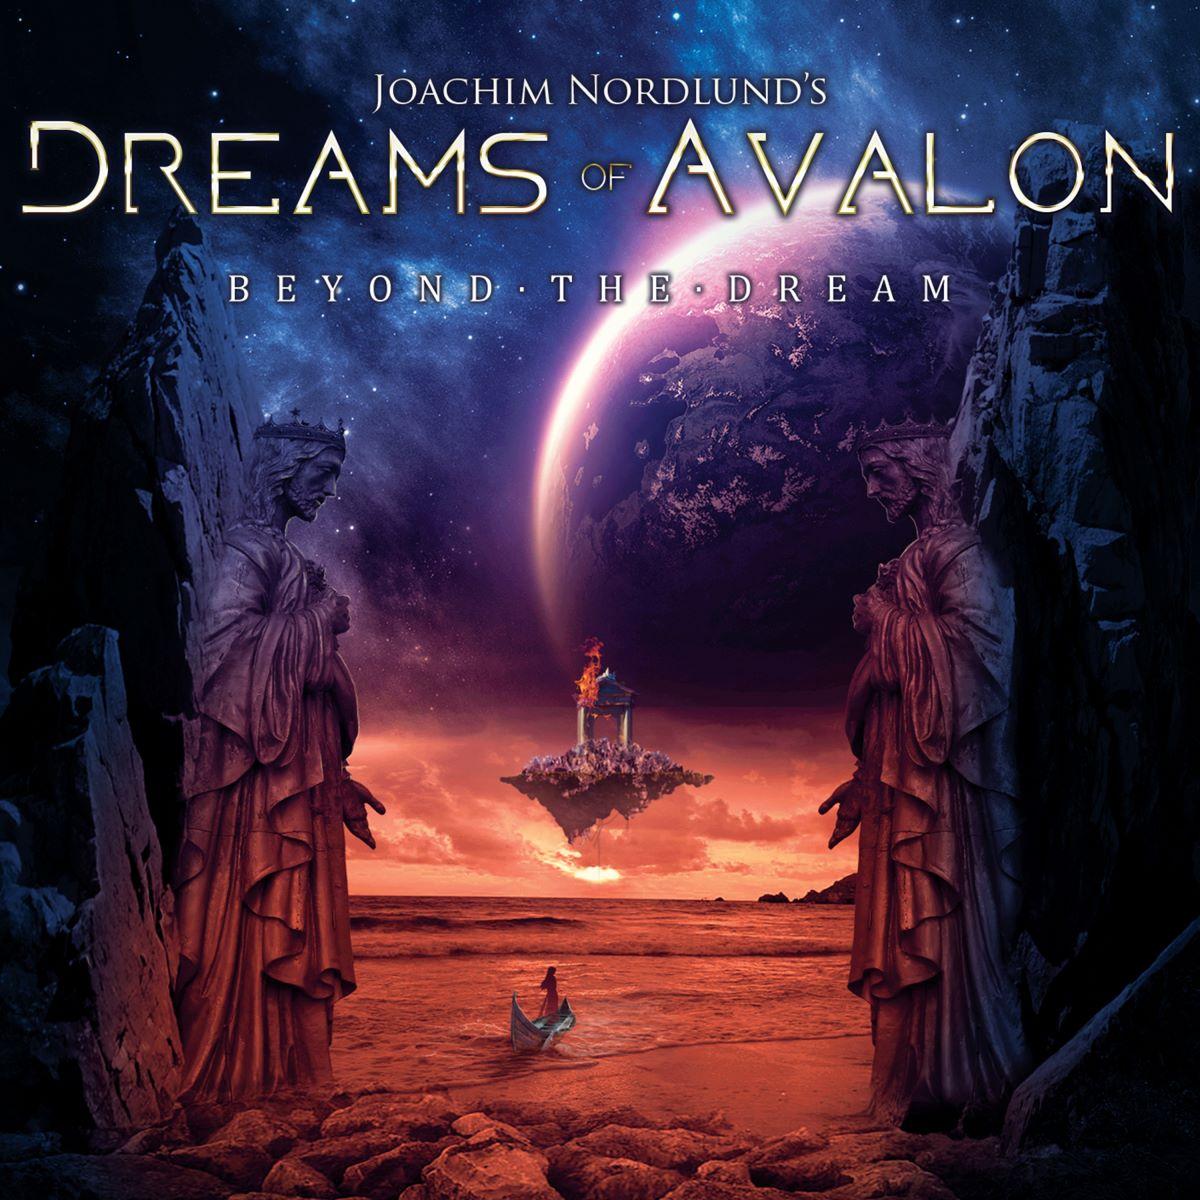 Dreams of Avalon - Beyond the dream - album cover